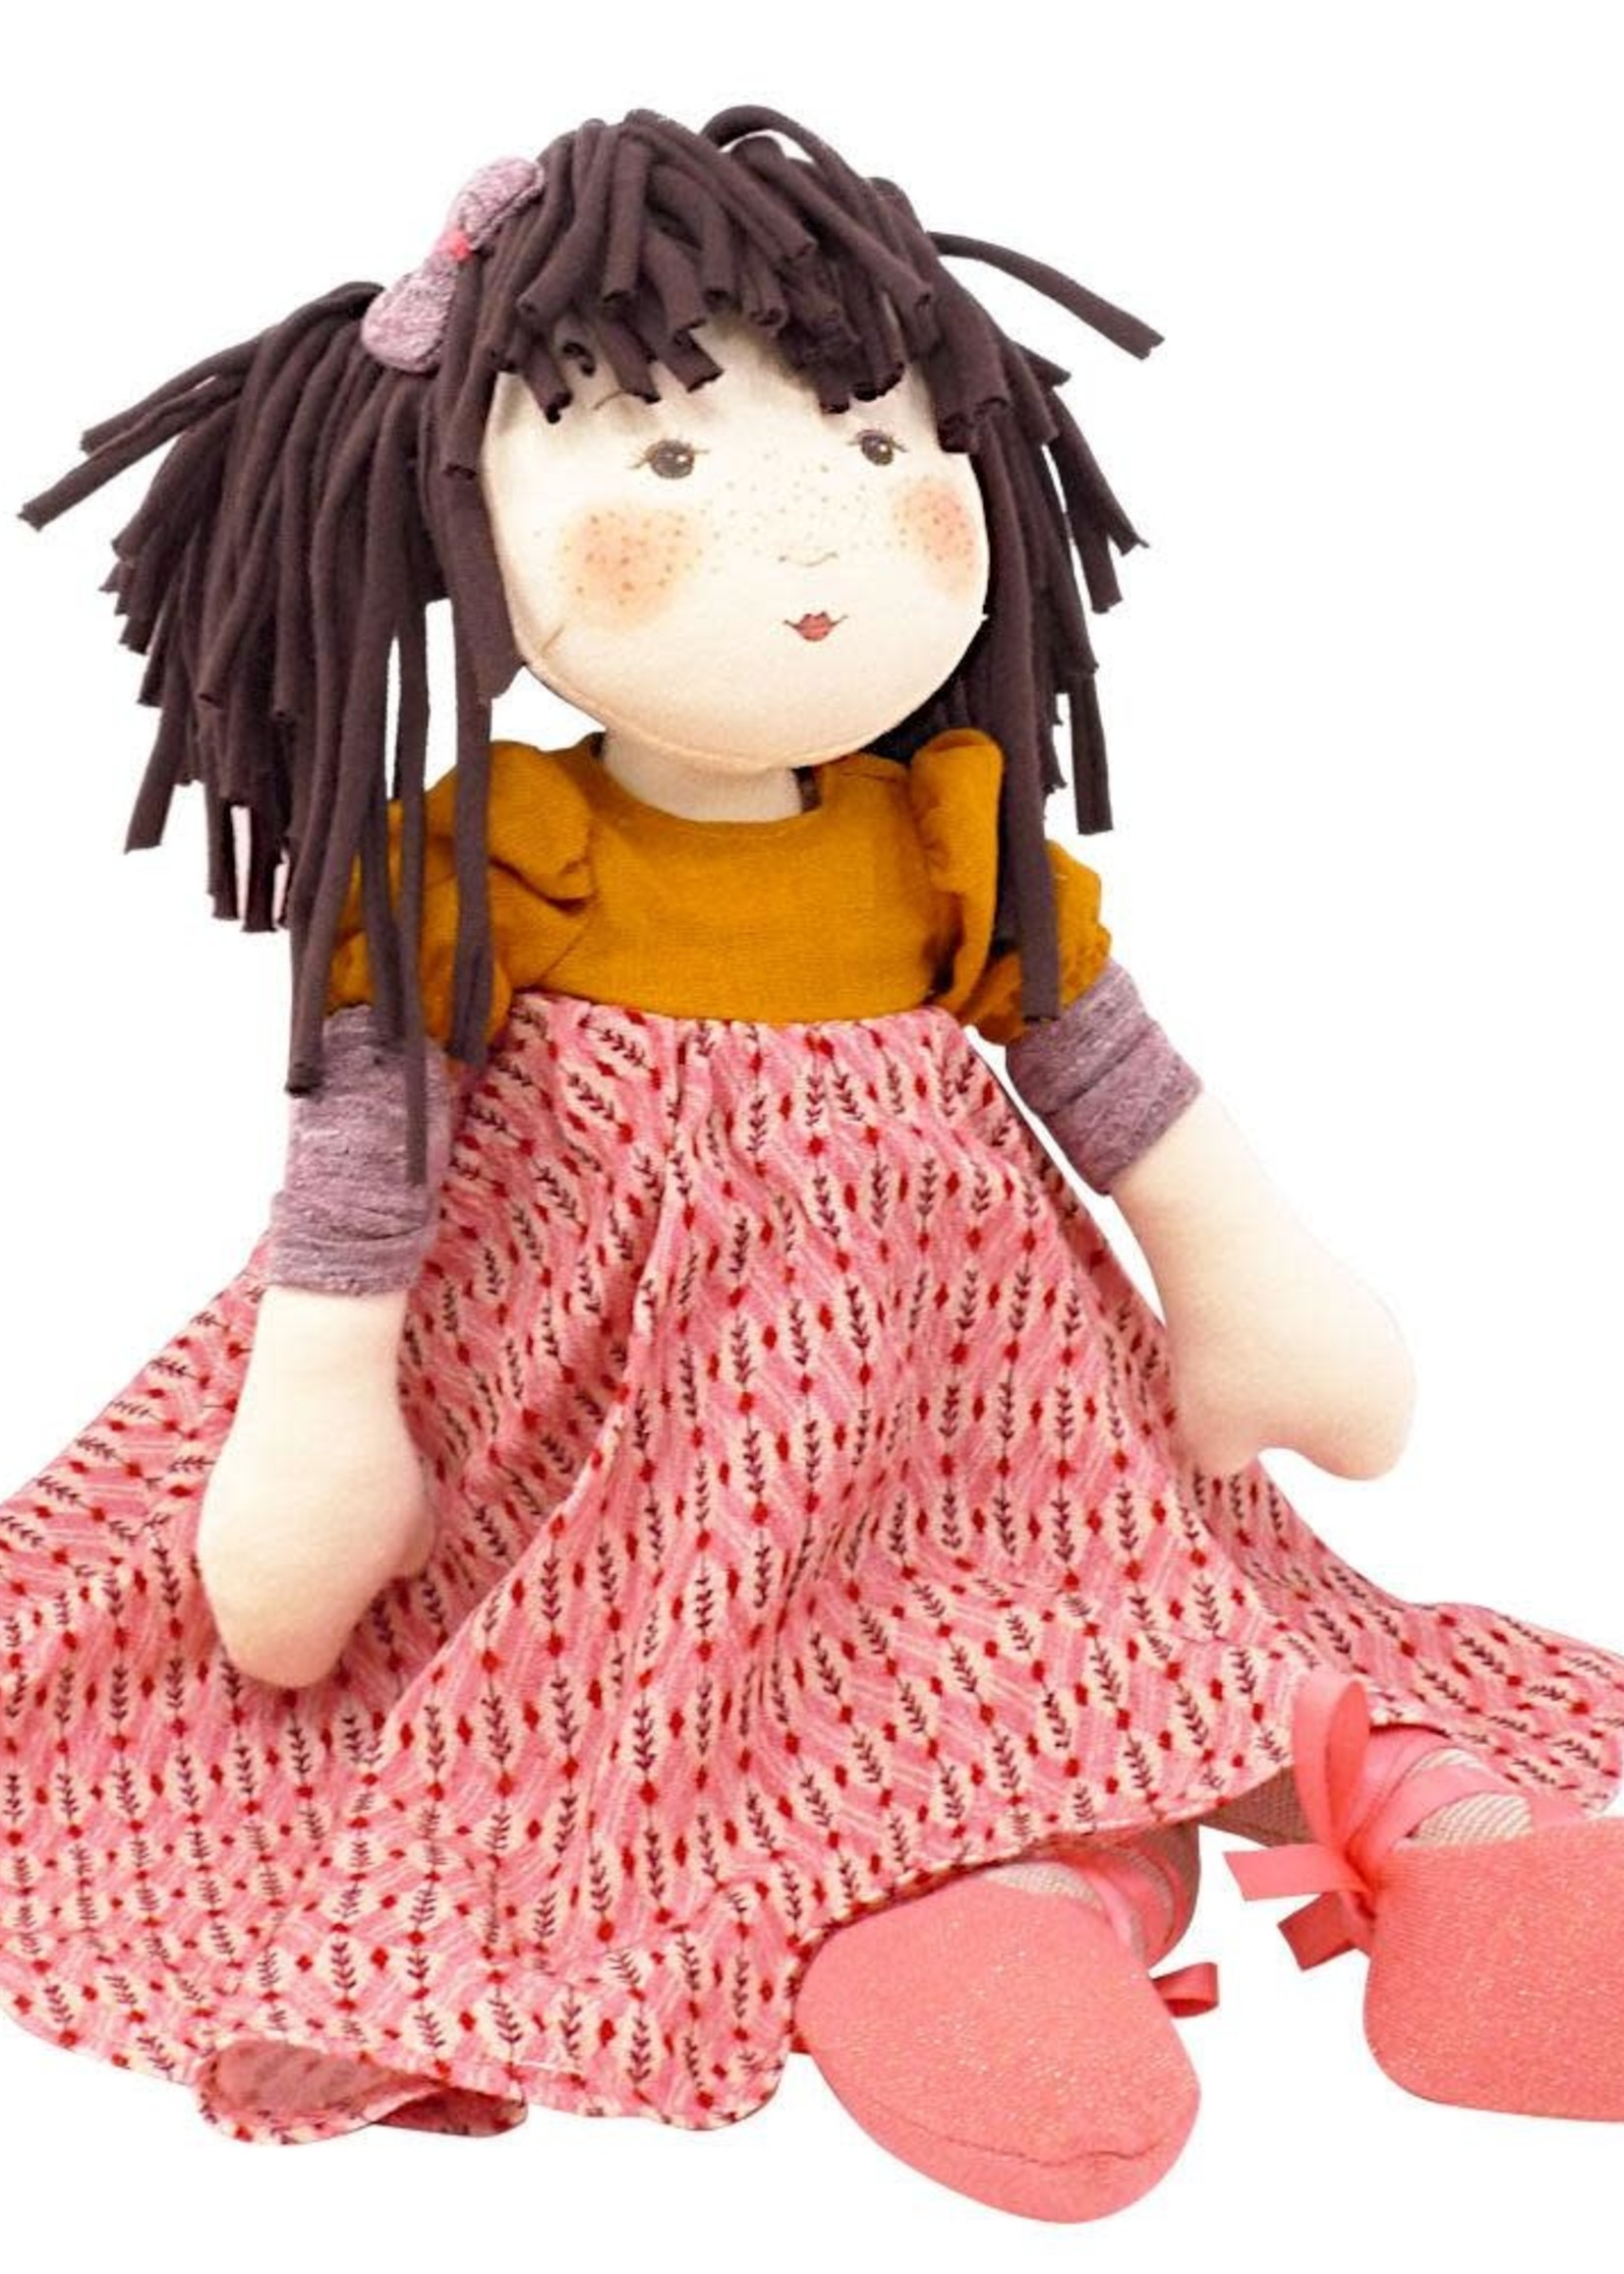 Moulin Roty Moulin Roty Prunelle Rag Doll